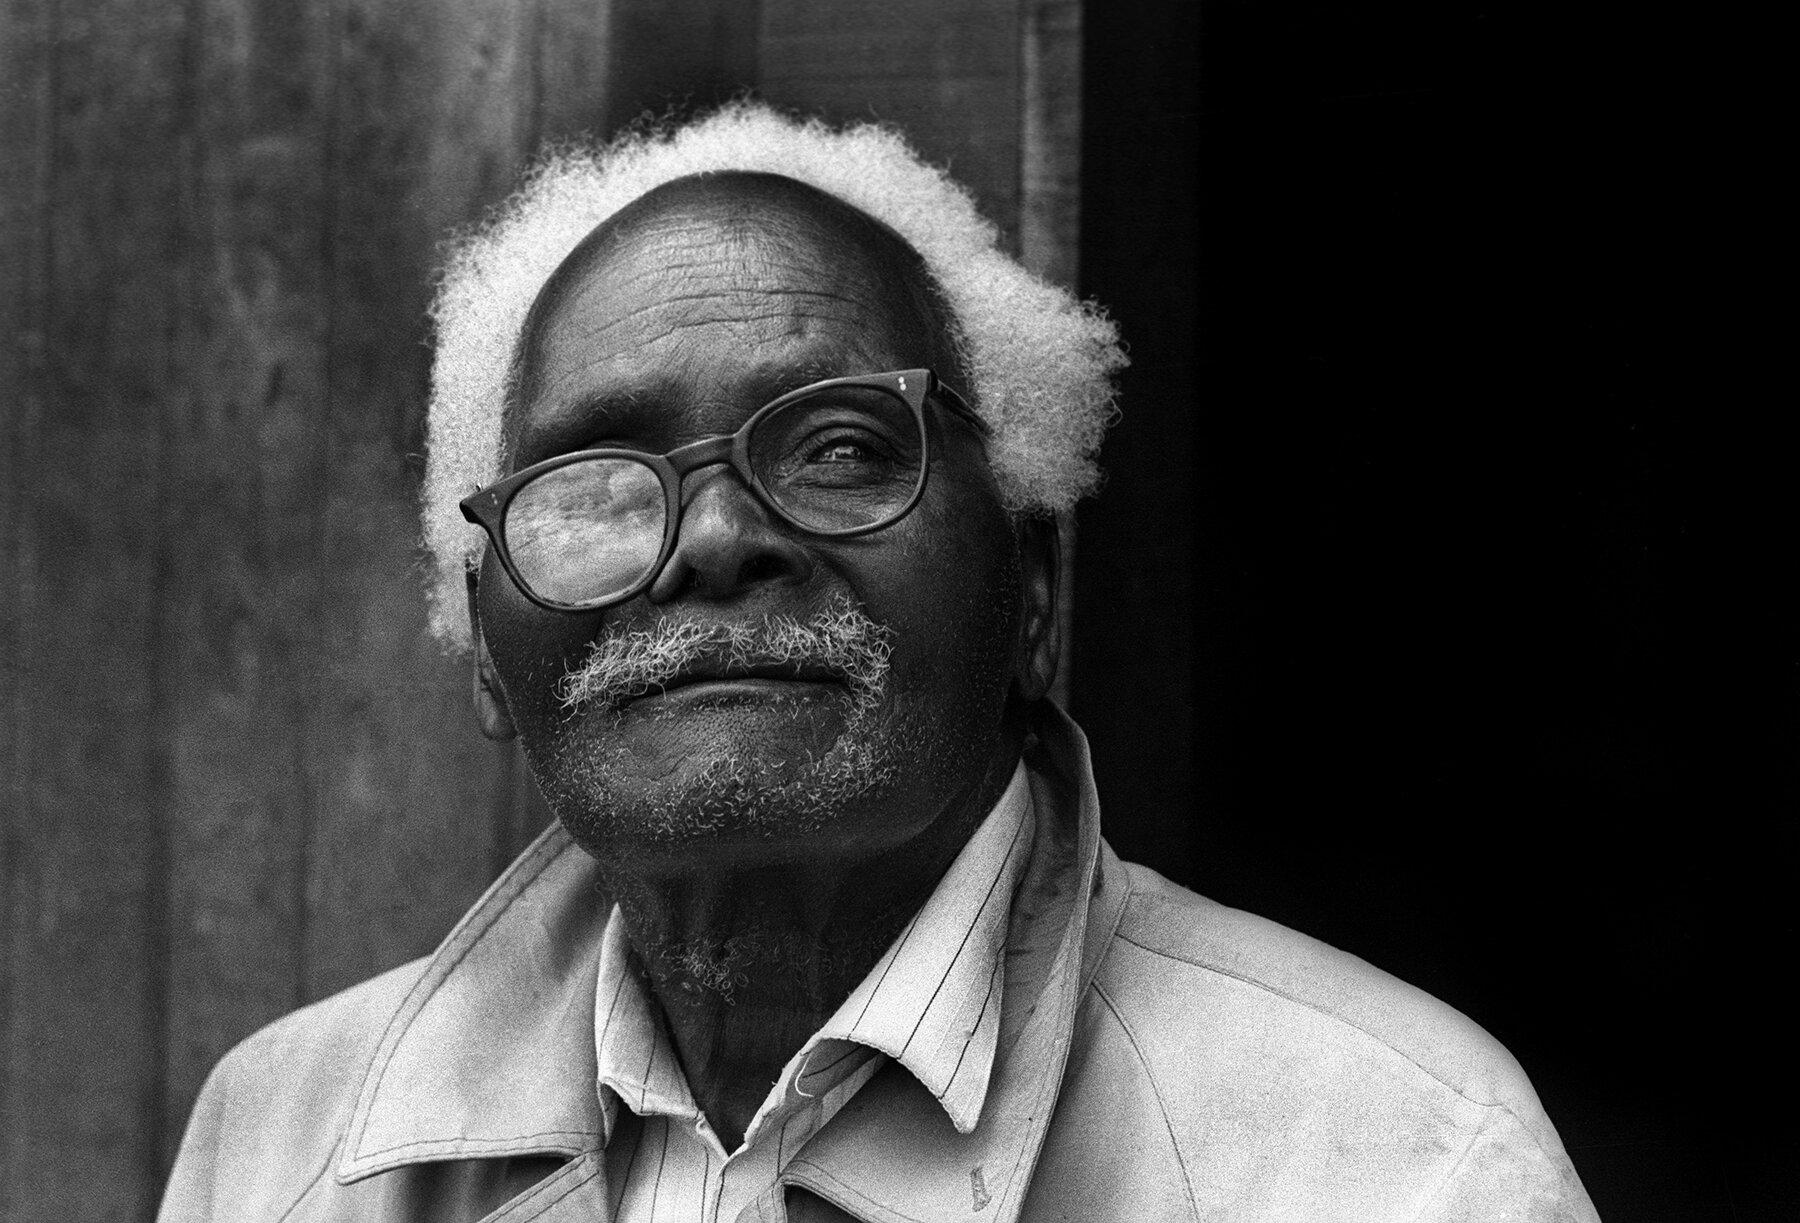 Kikuyu elder, Limuru District, Kenya 1989